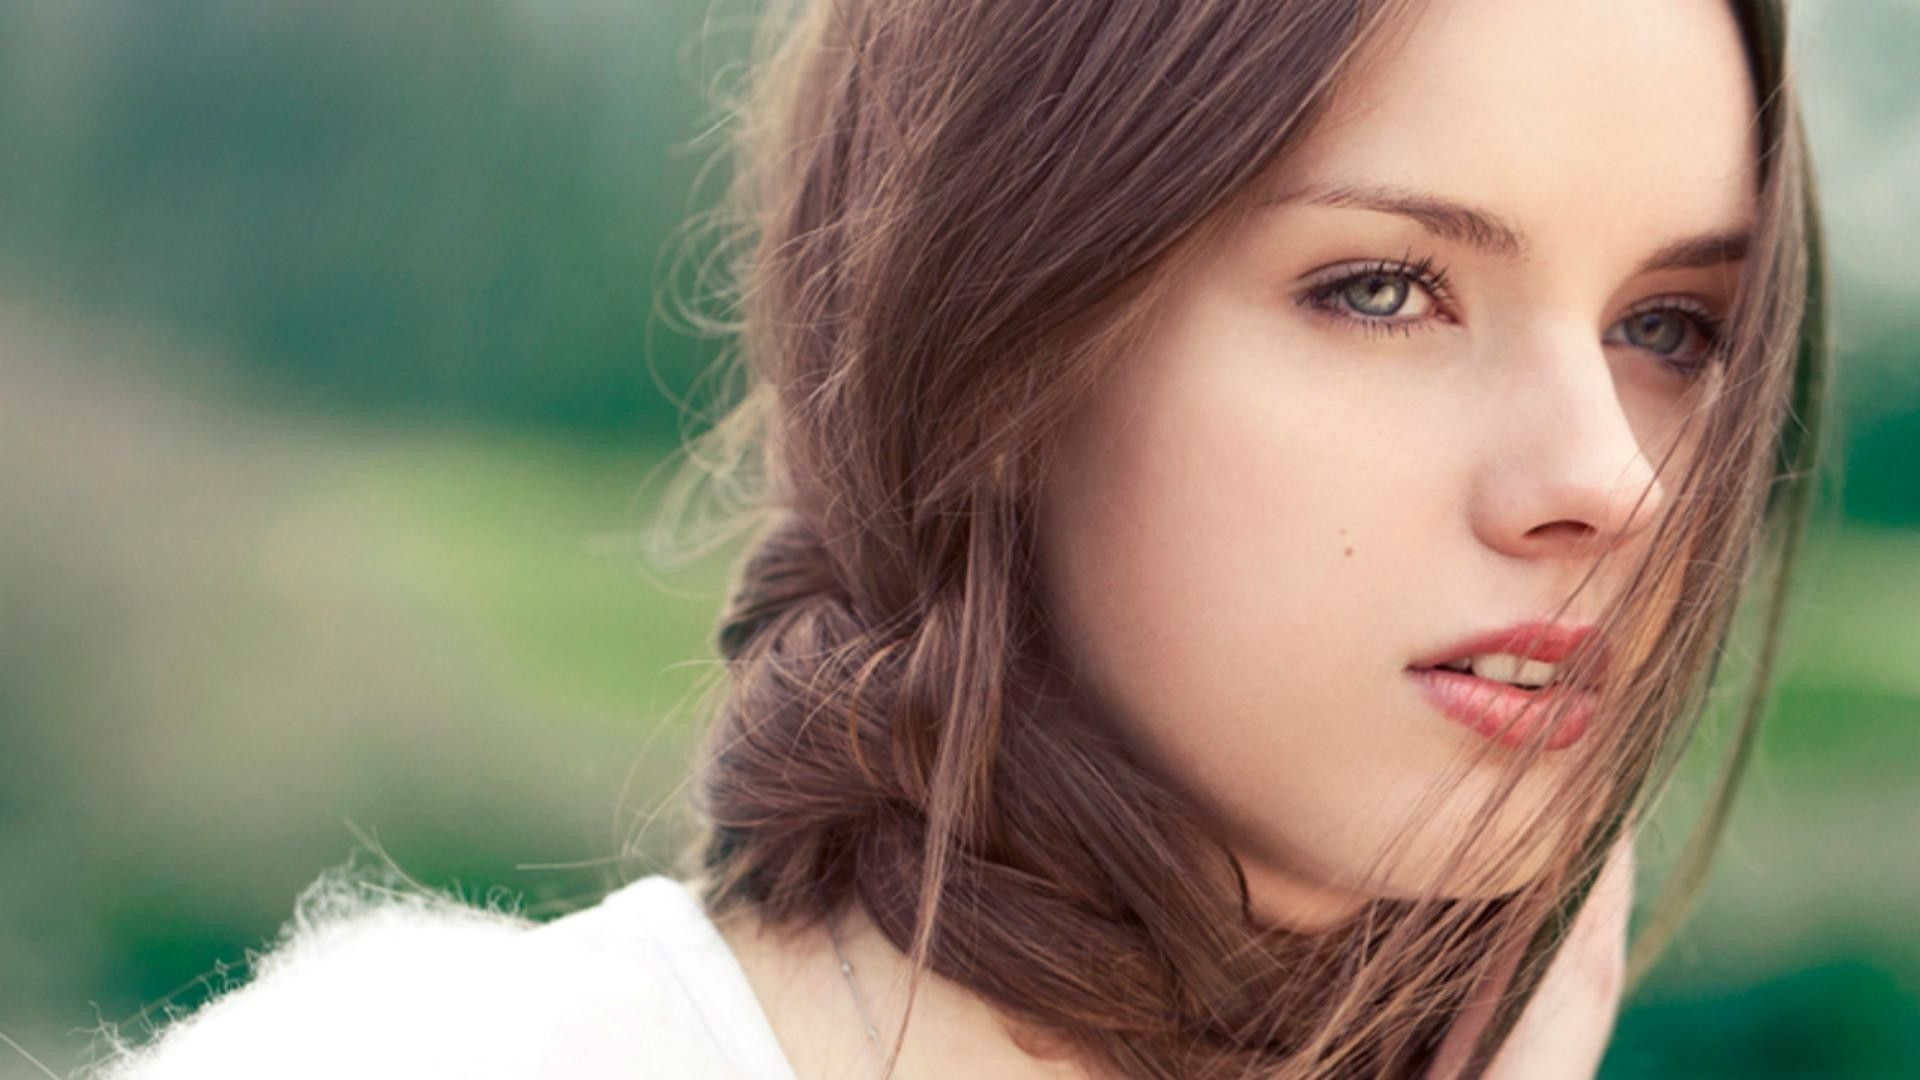 Beauty Girl Hd Wallpapers Top Free Beauty Girl Hd Backgrounds Wallpaperaccess